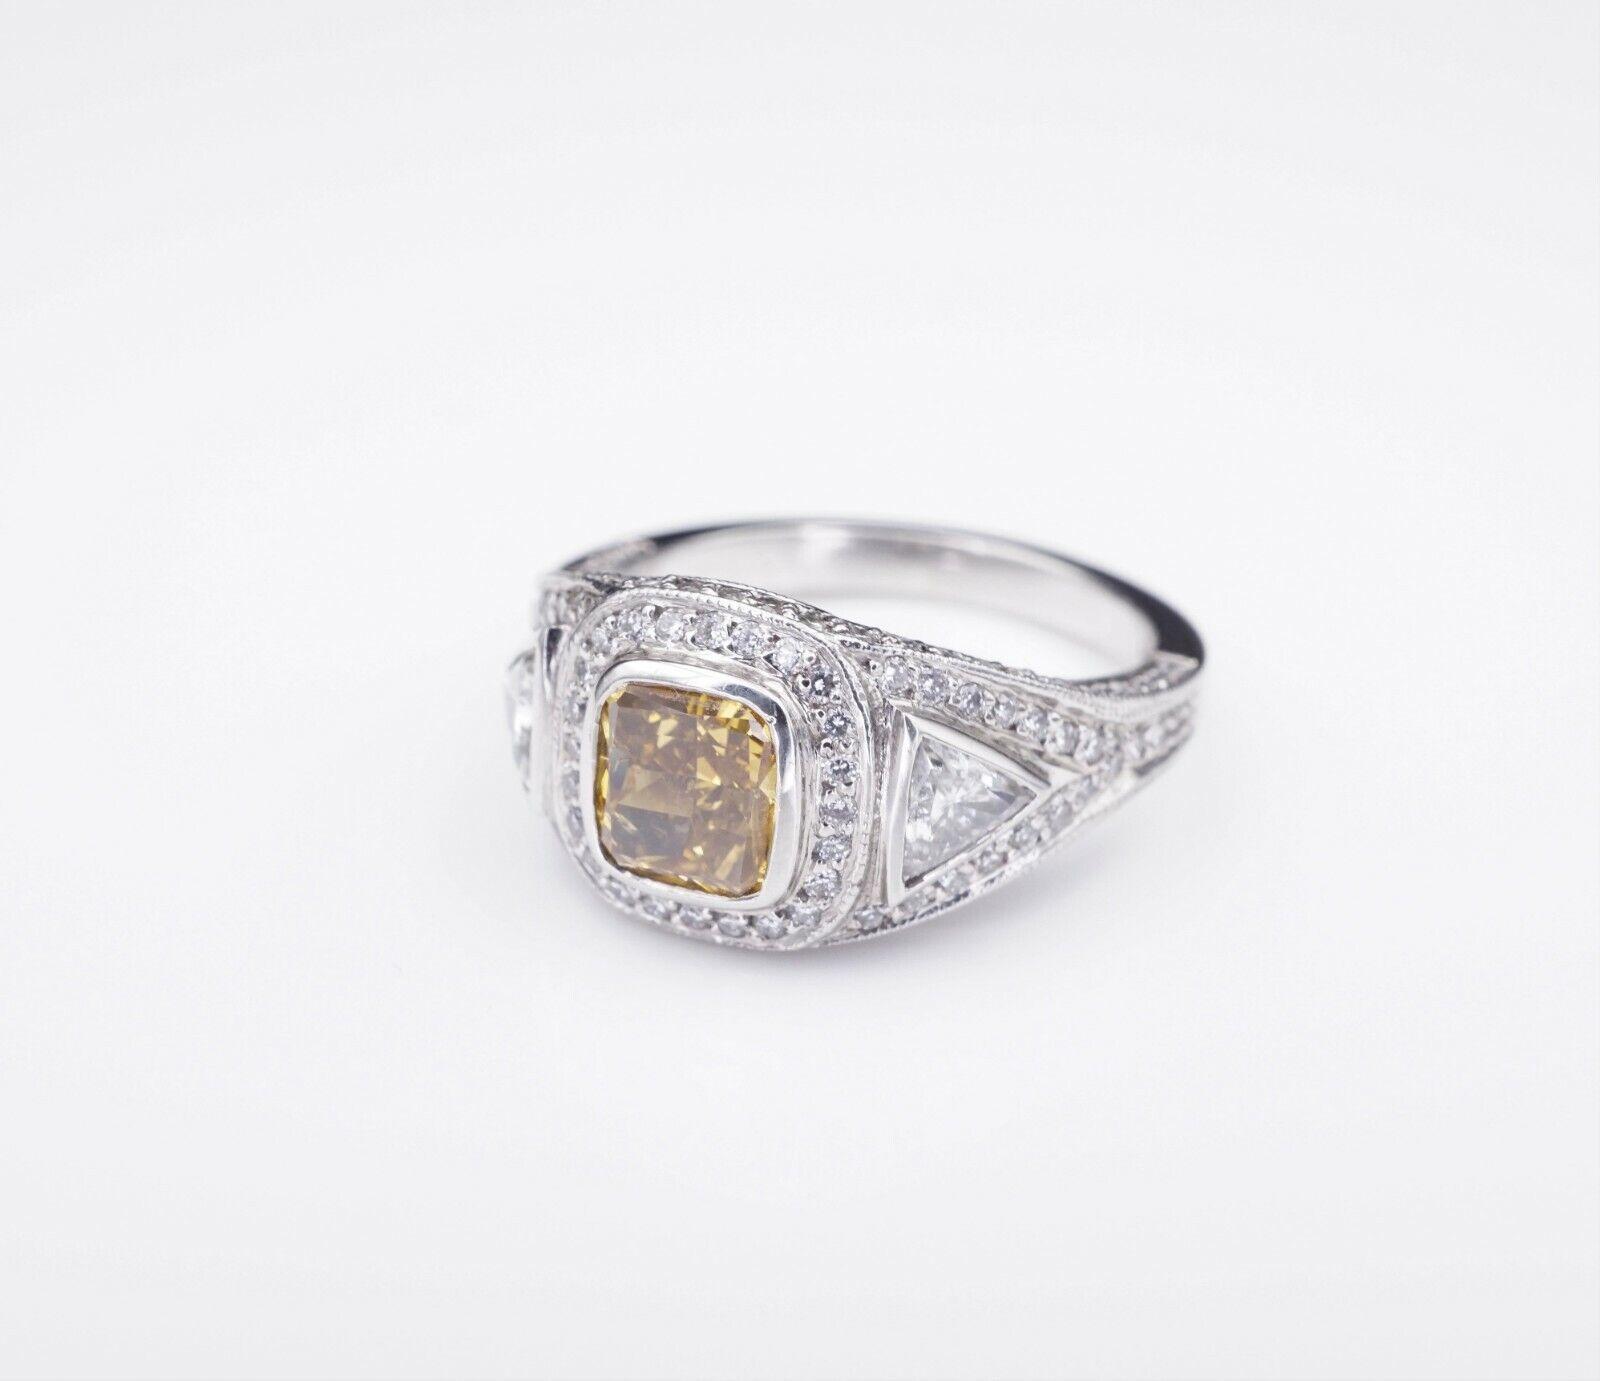 Platinum 3ct Orange-Yellow Diamond Halo Engagement Ring Size 6.75 GIA CO450 2